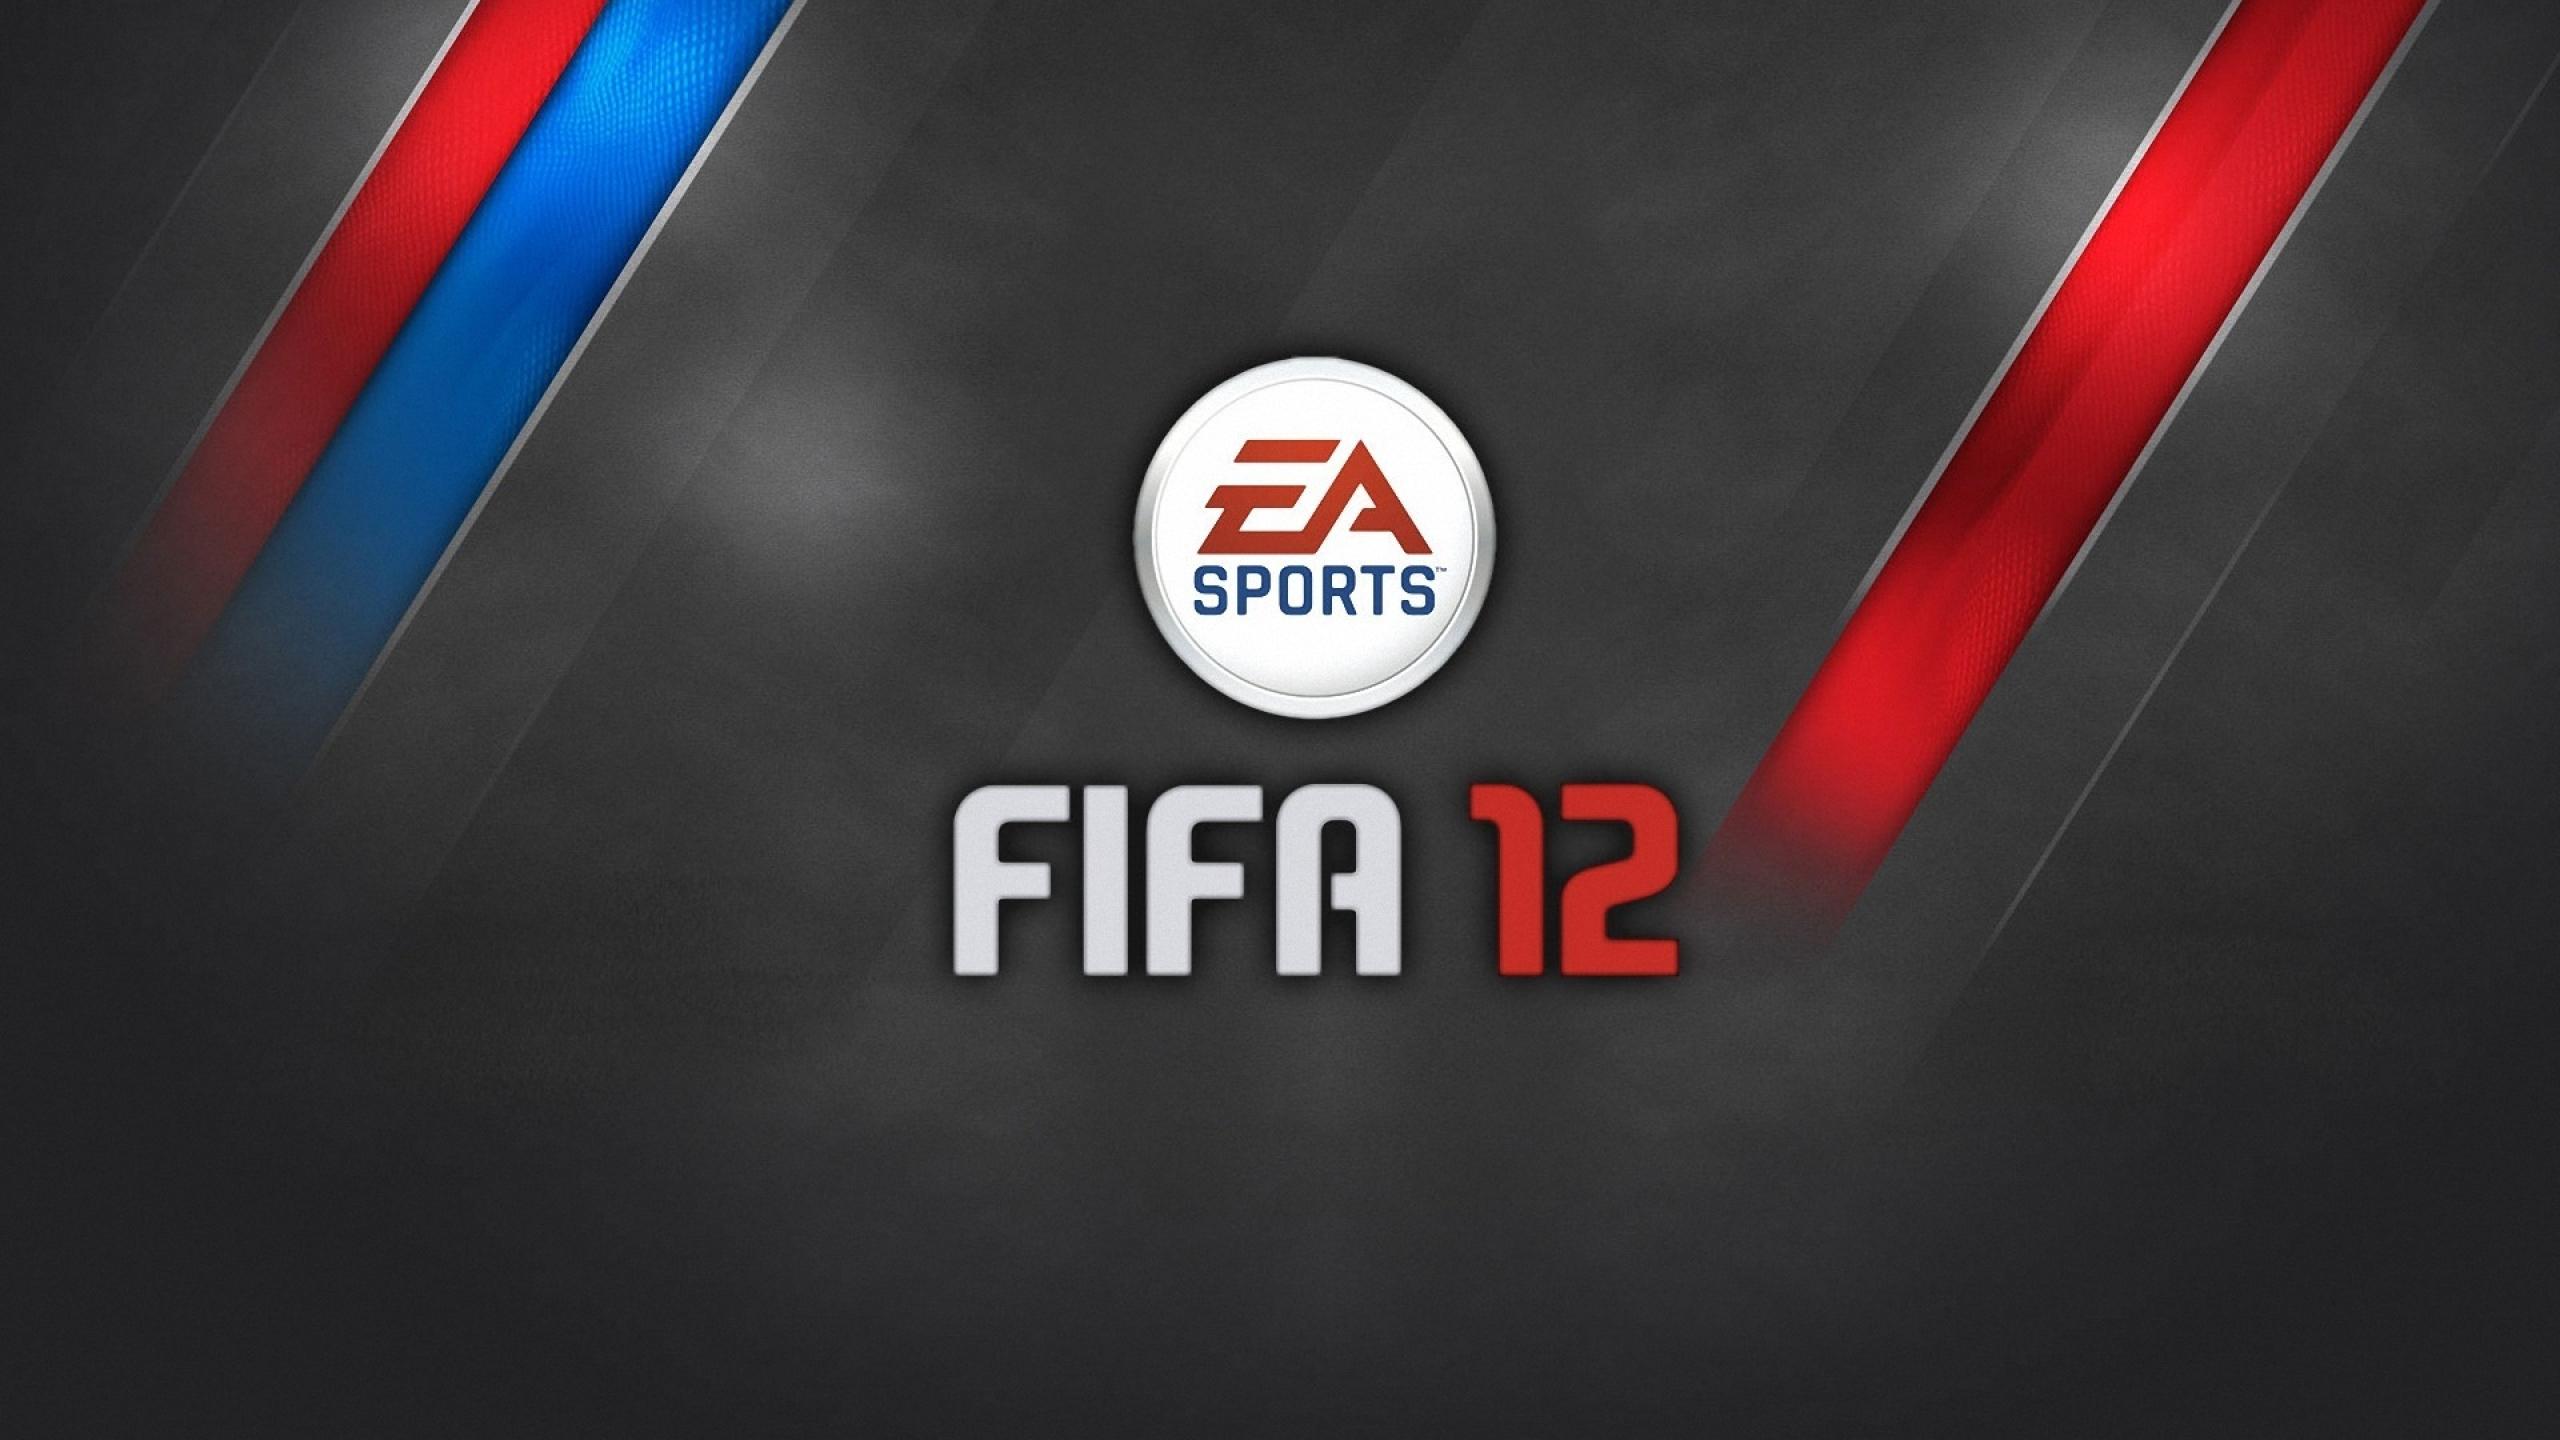 2560x1440 Fifa 12 Name Font 1440p Resolution Wallpaper Hd